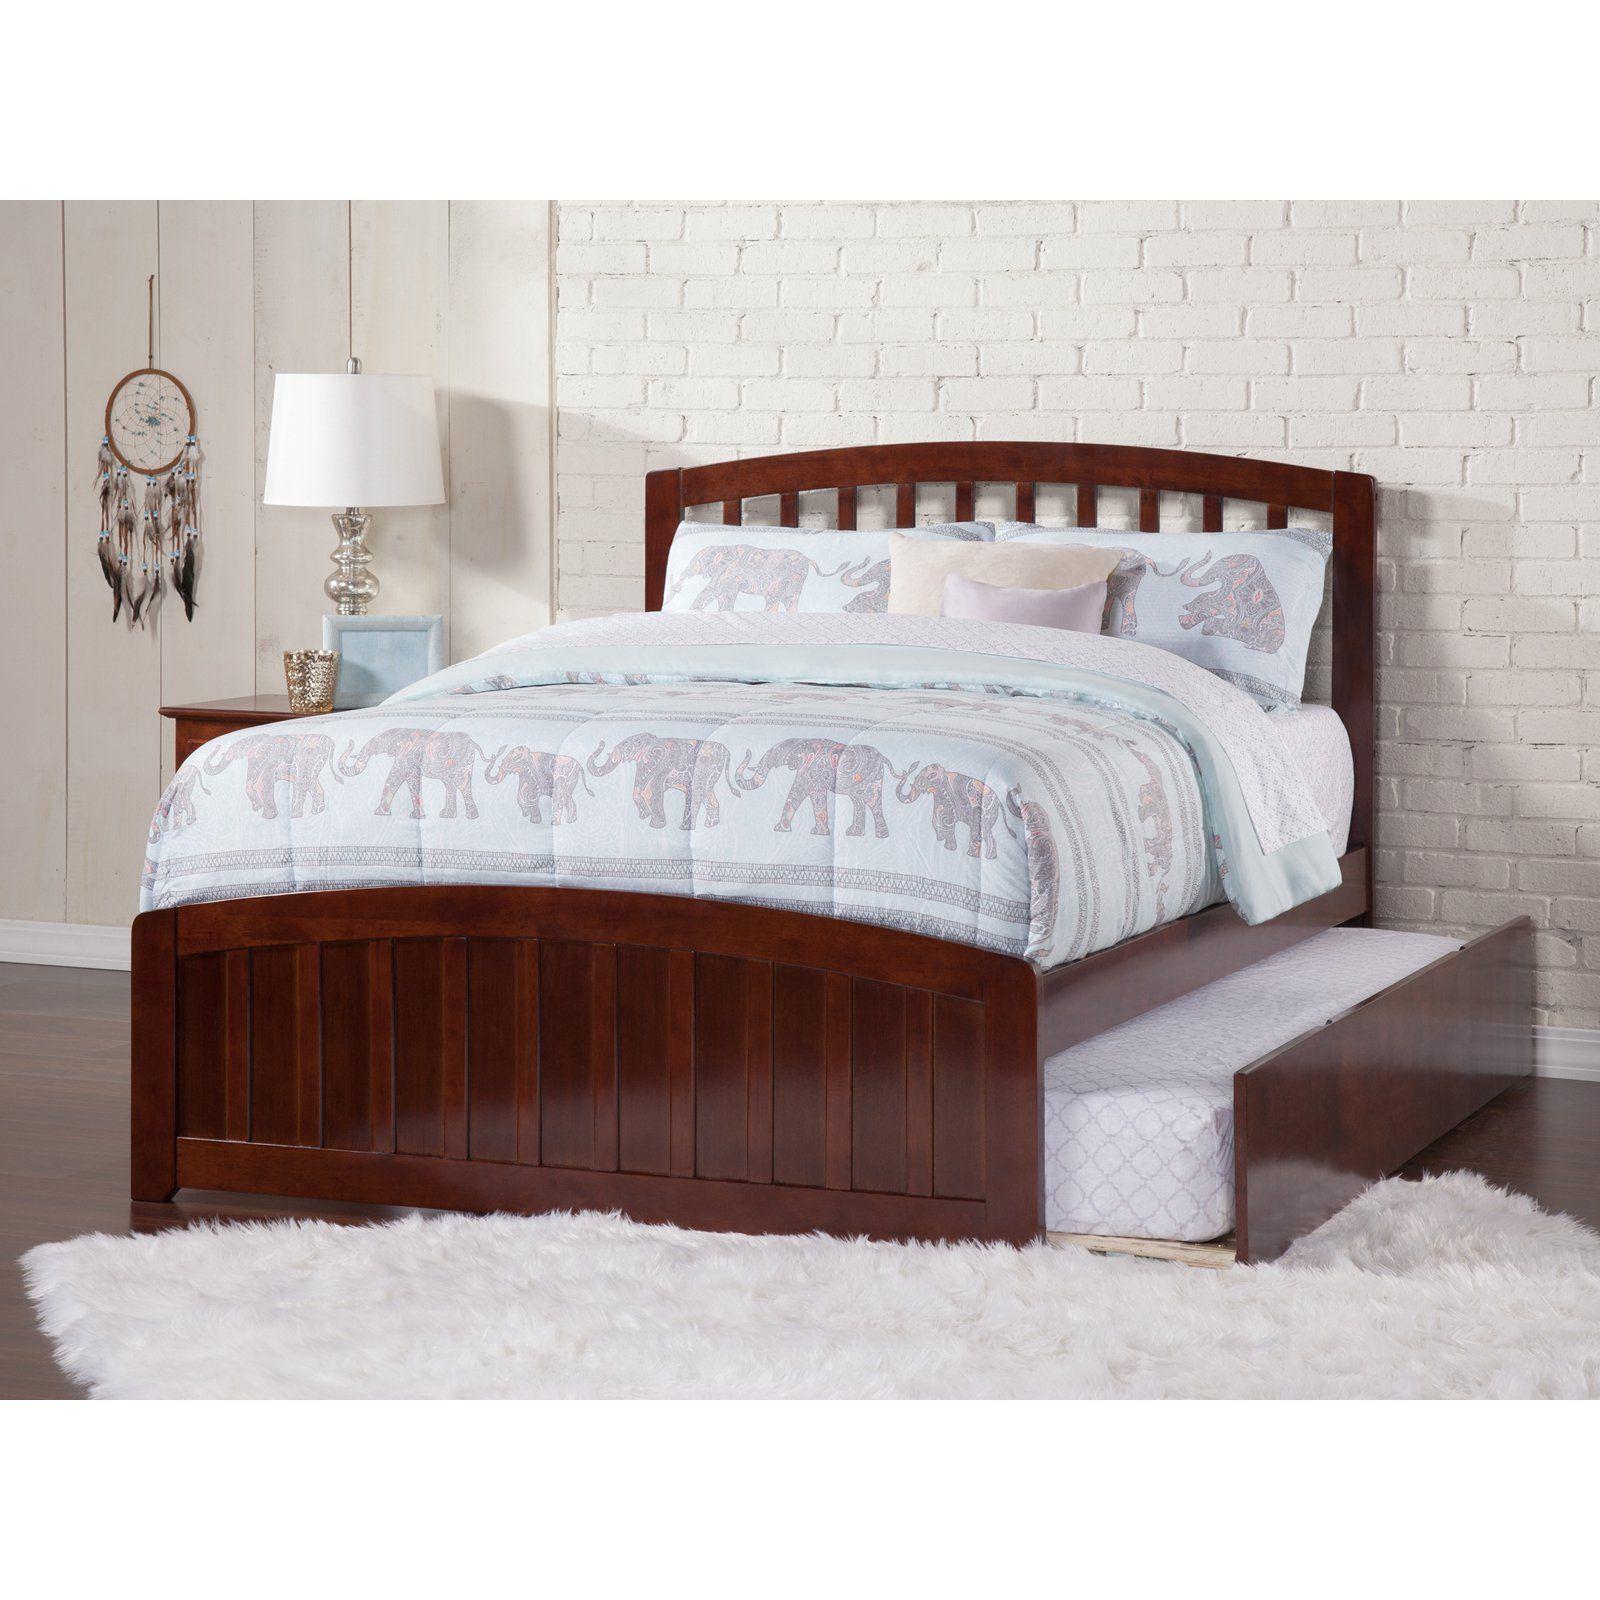 Atlantic Furniture Richmond Platform Bed with Matching